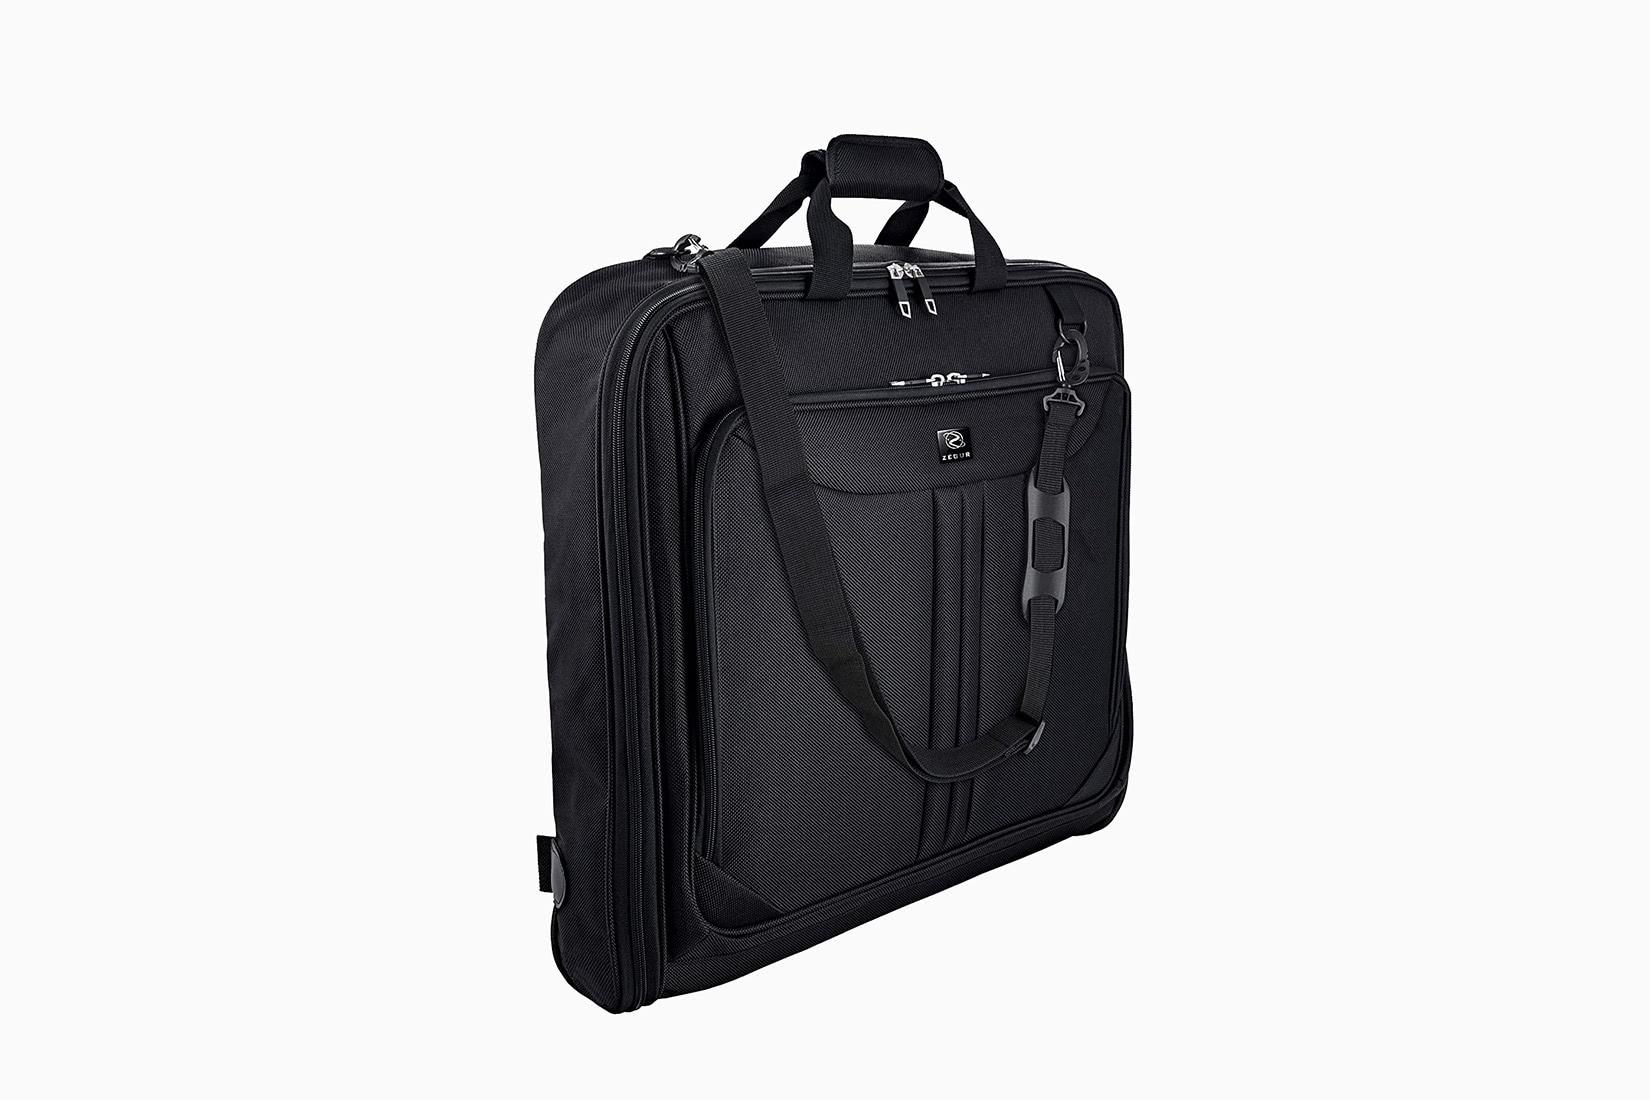 best garment bags value zegur review - Luxe Digital